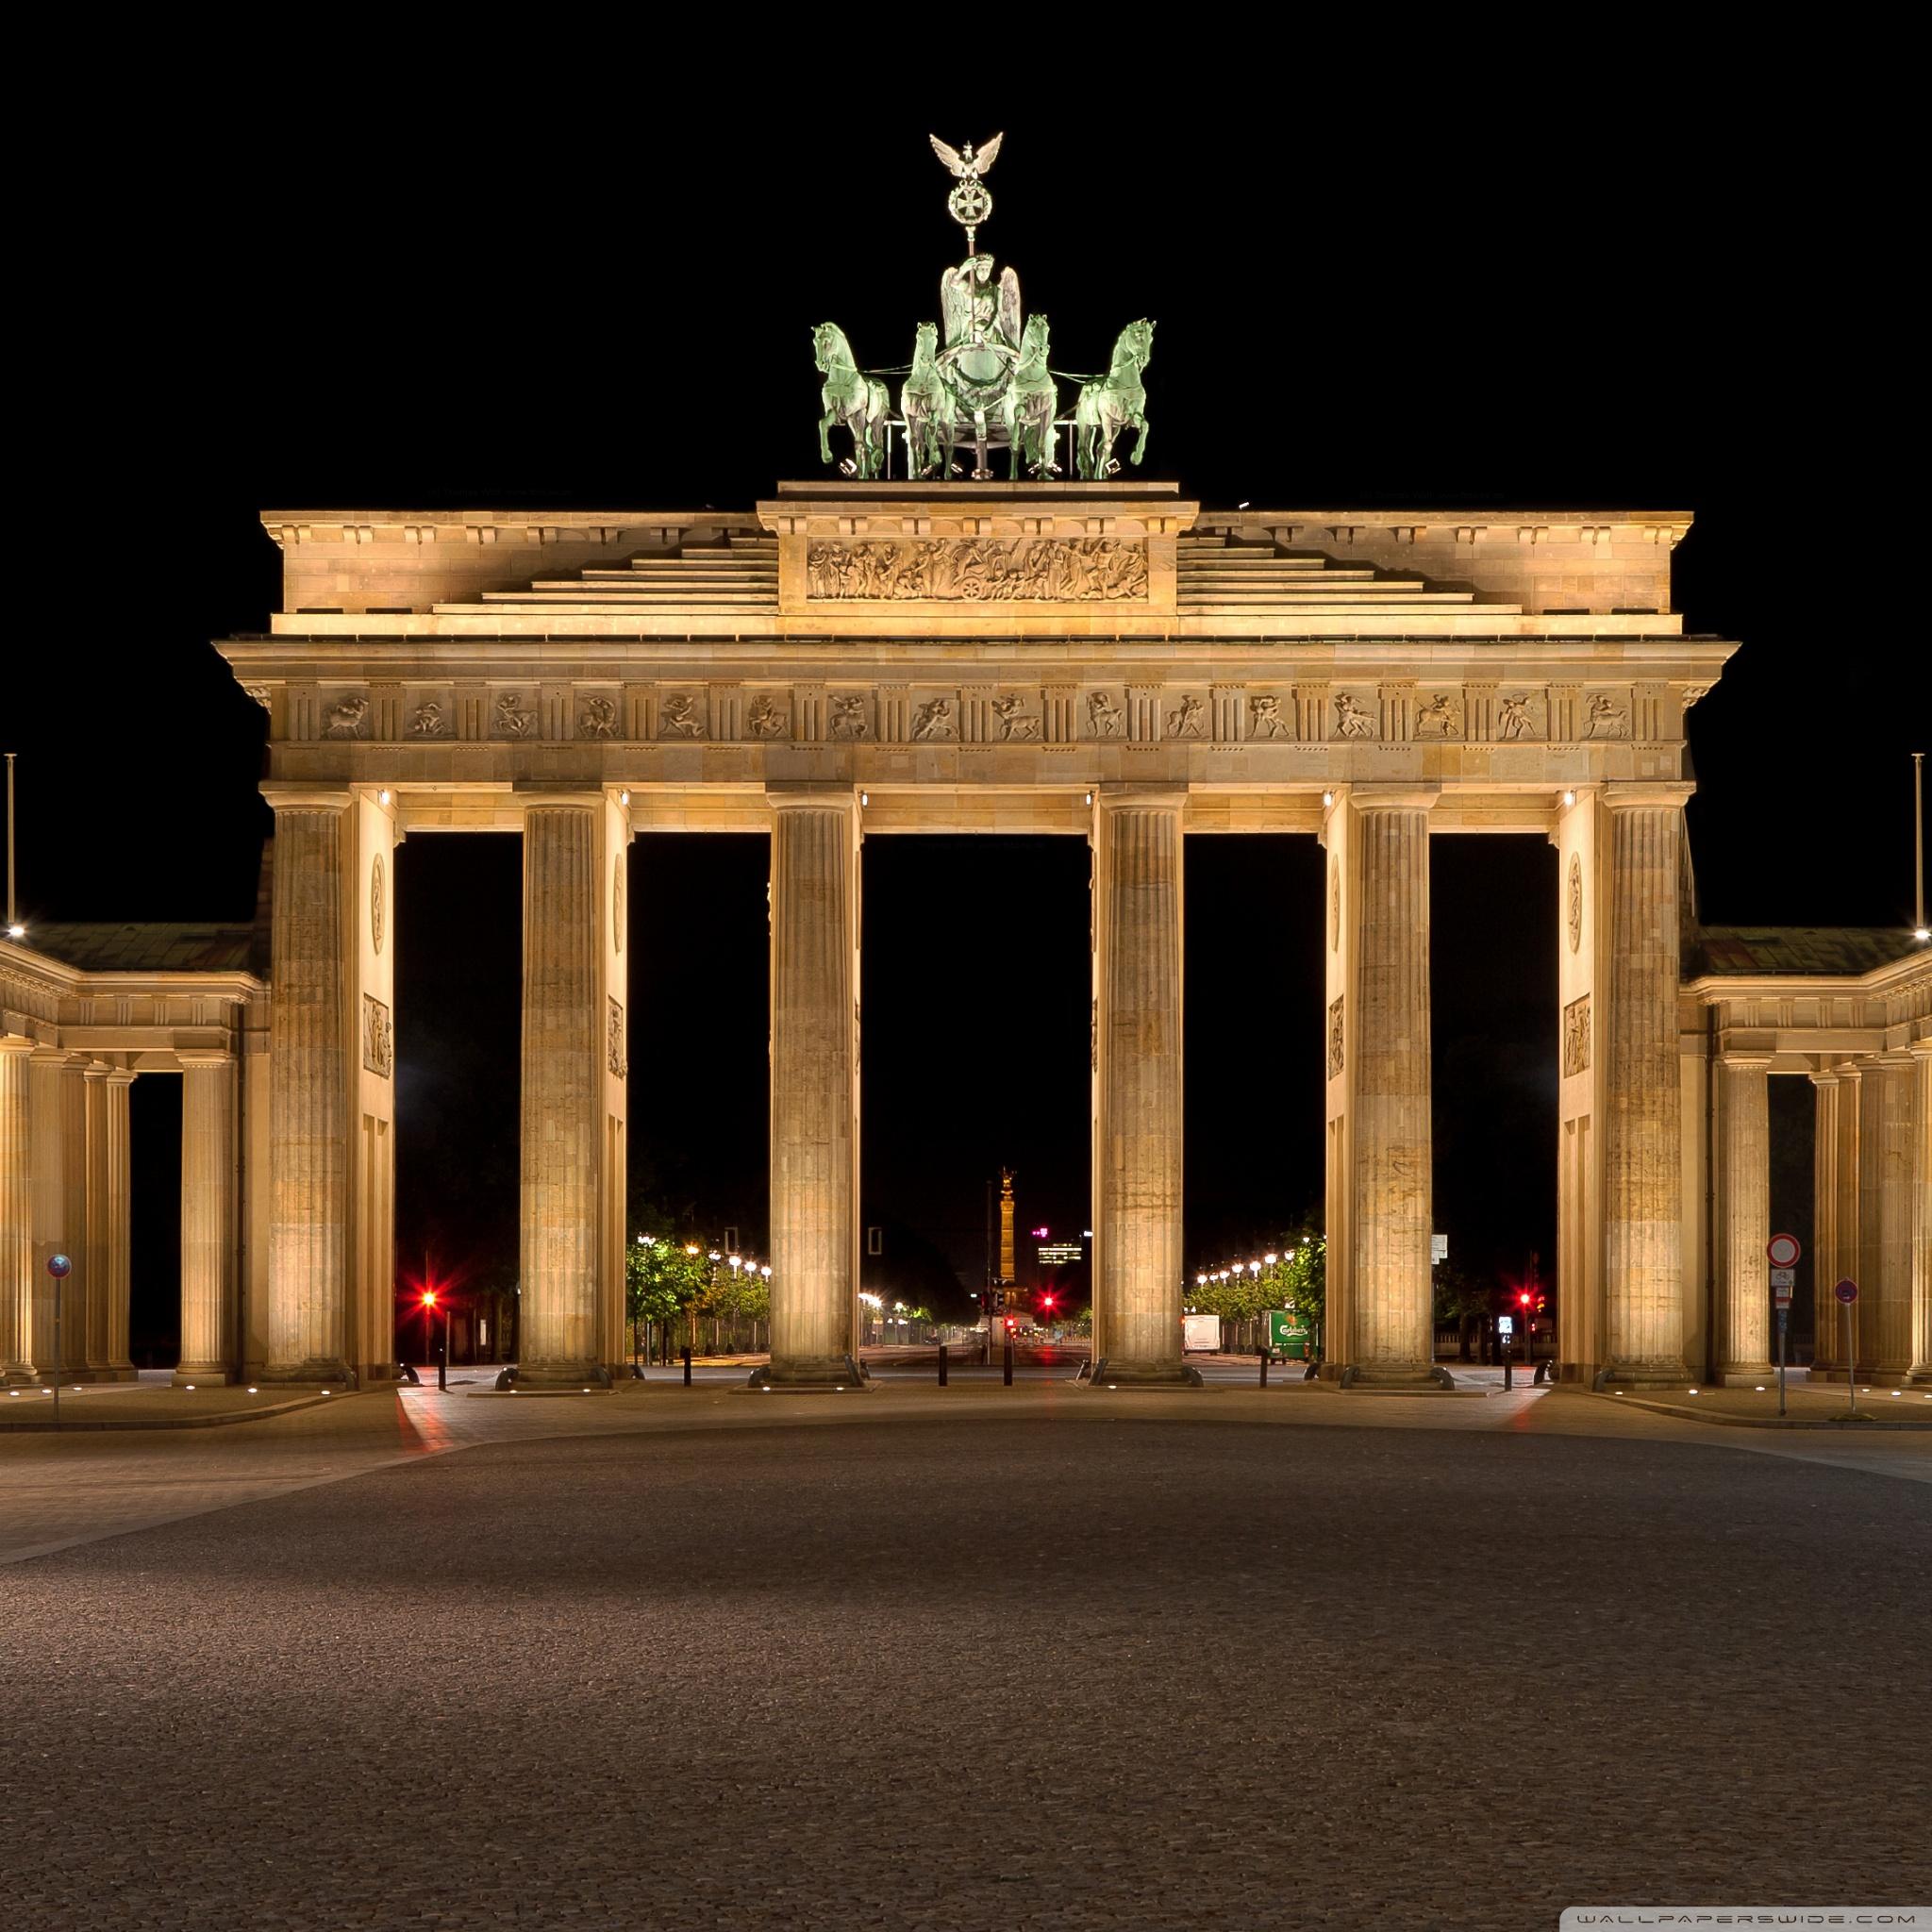 Brandenburg Gate 4K HD Desktop Wallpaper for 4K Ultra HD TV 2048x2048